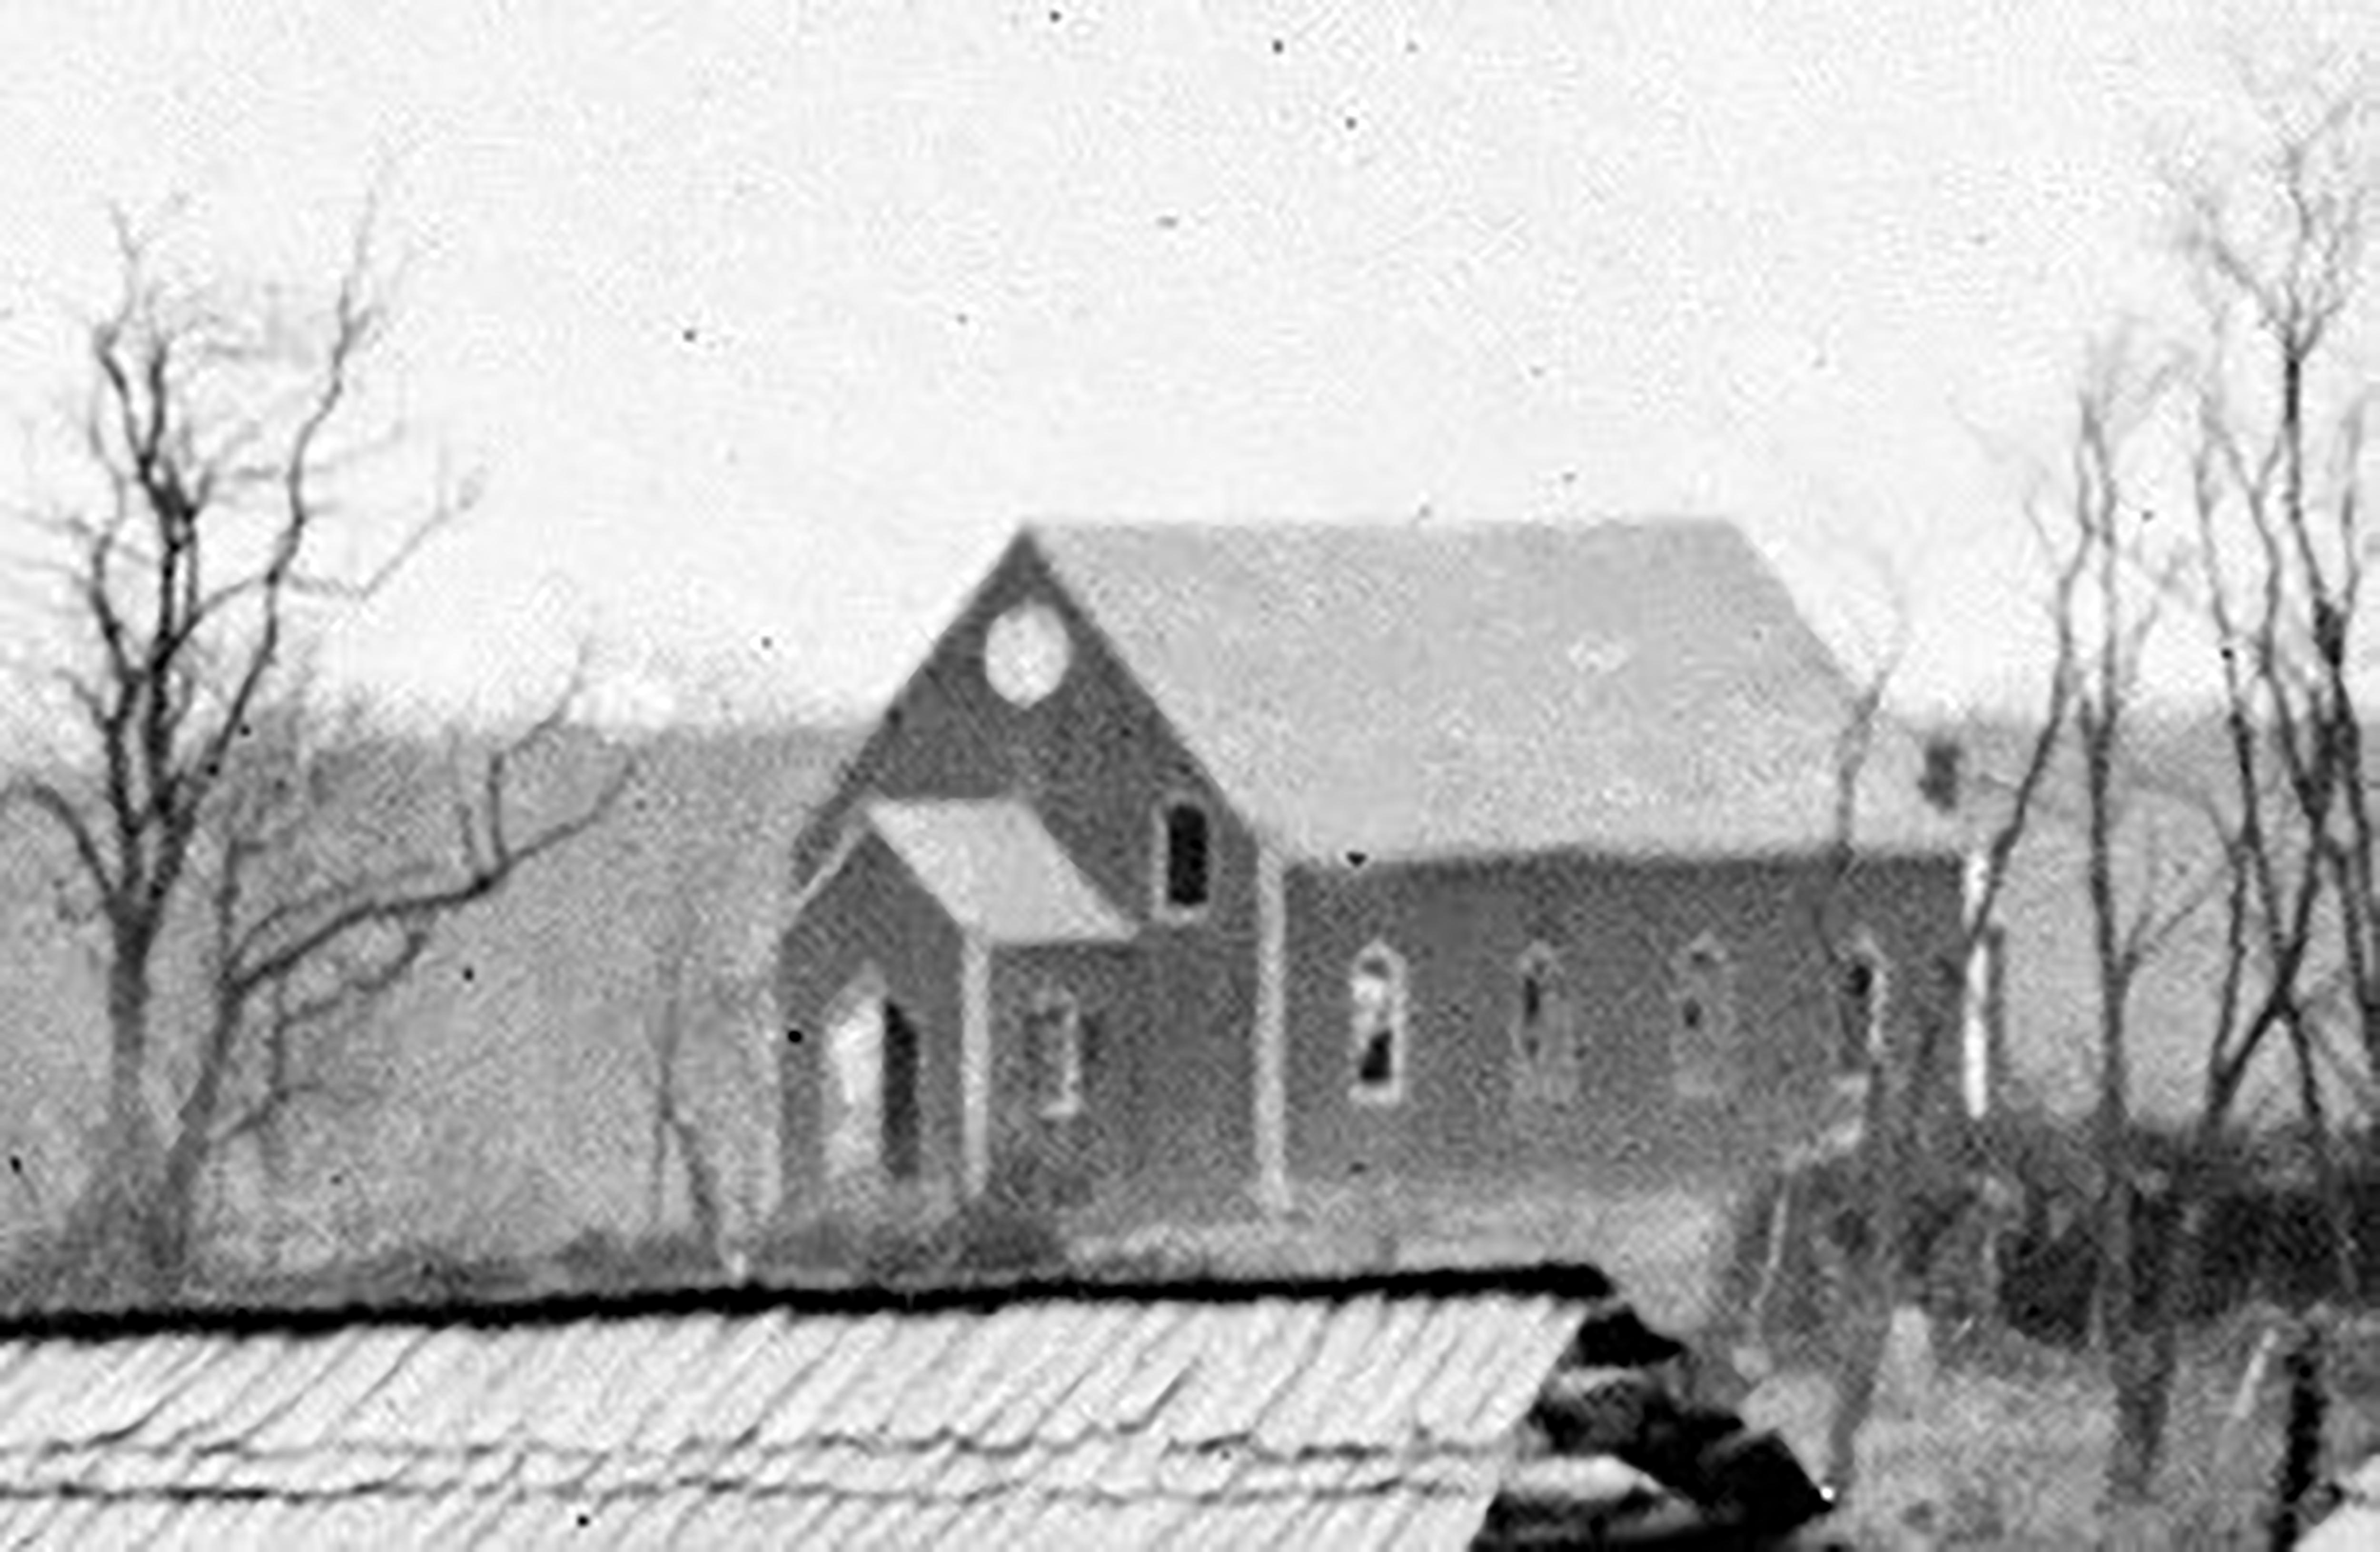 Original Saint John's Church, 1862. Note the broken windows.